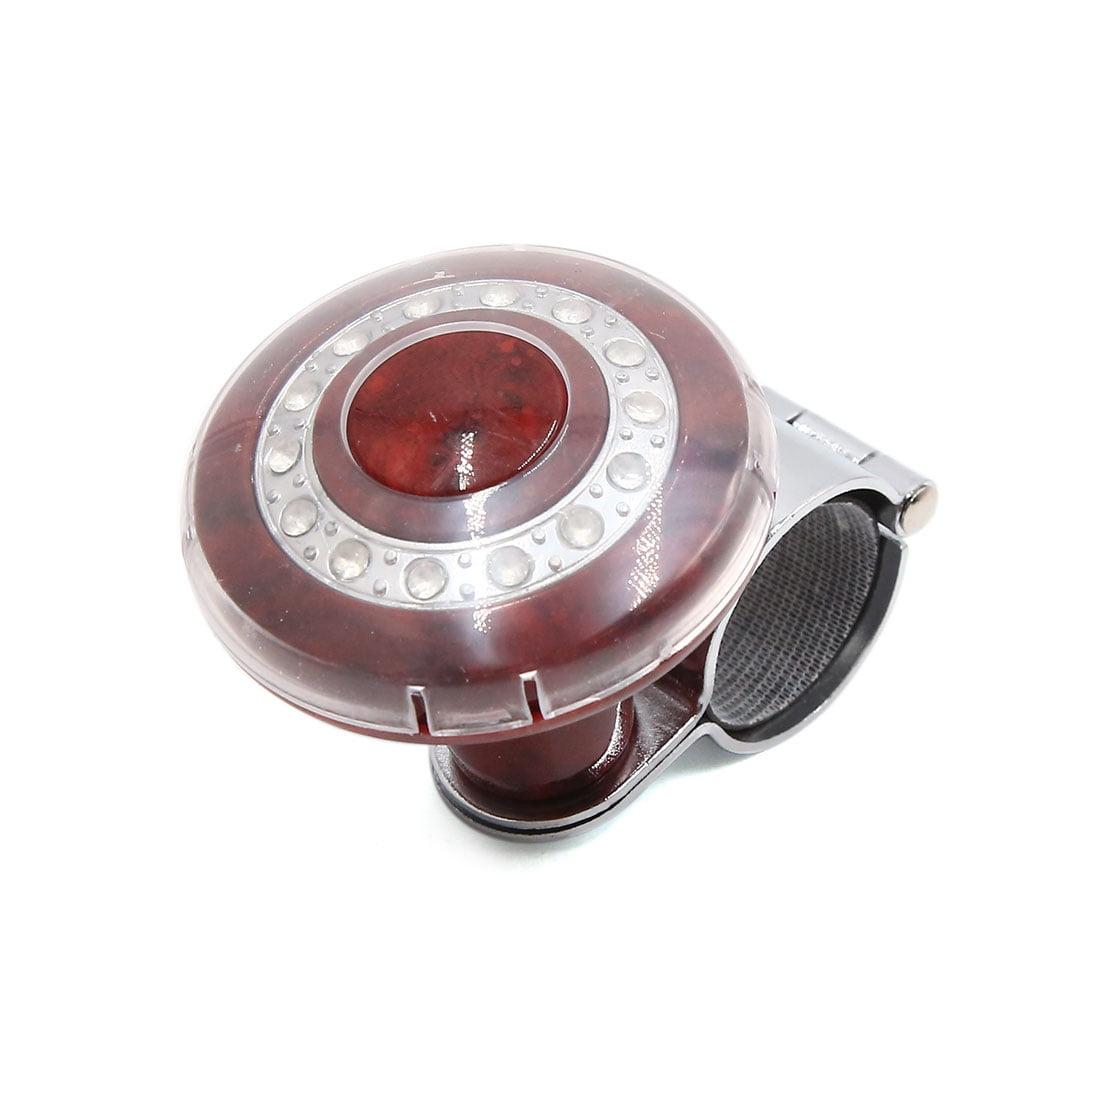 Brown Auto Car Power Steering Wheel Ball Handle  Knob Booster